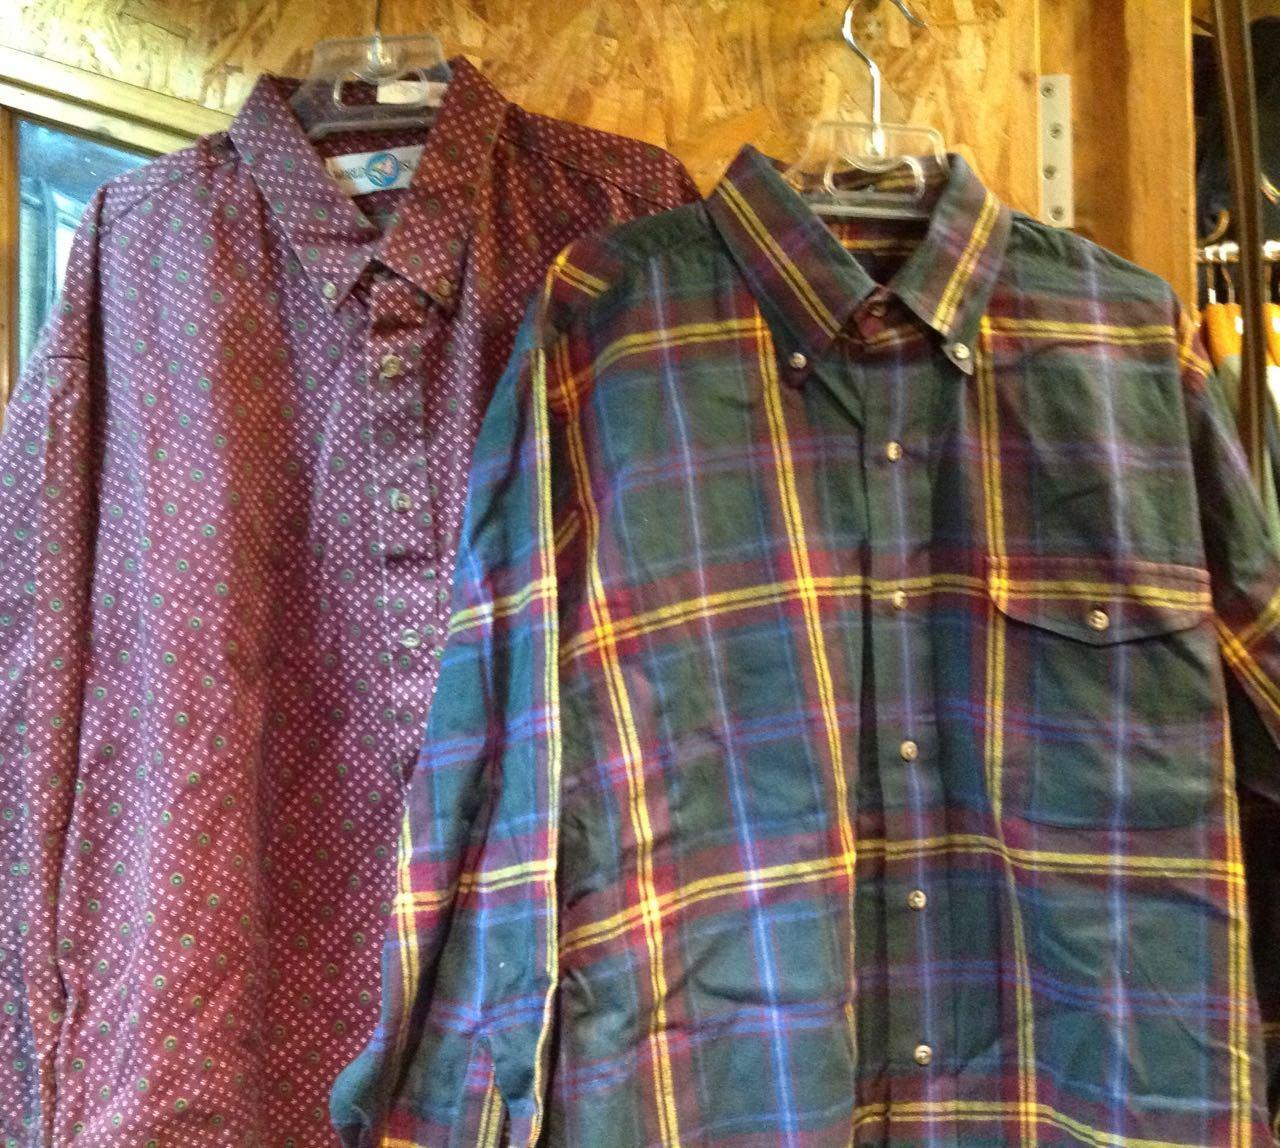 90s OLD GAP、GANT などシャツ入荷しております!_c0144020_17372040.jpg